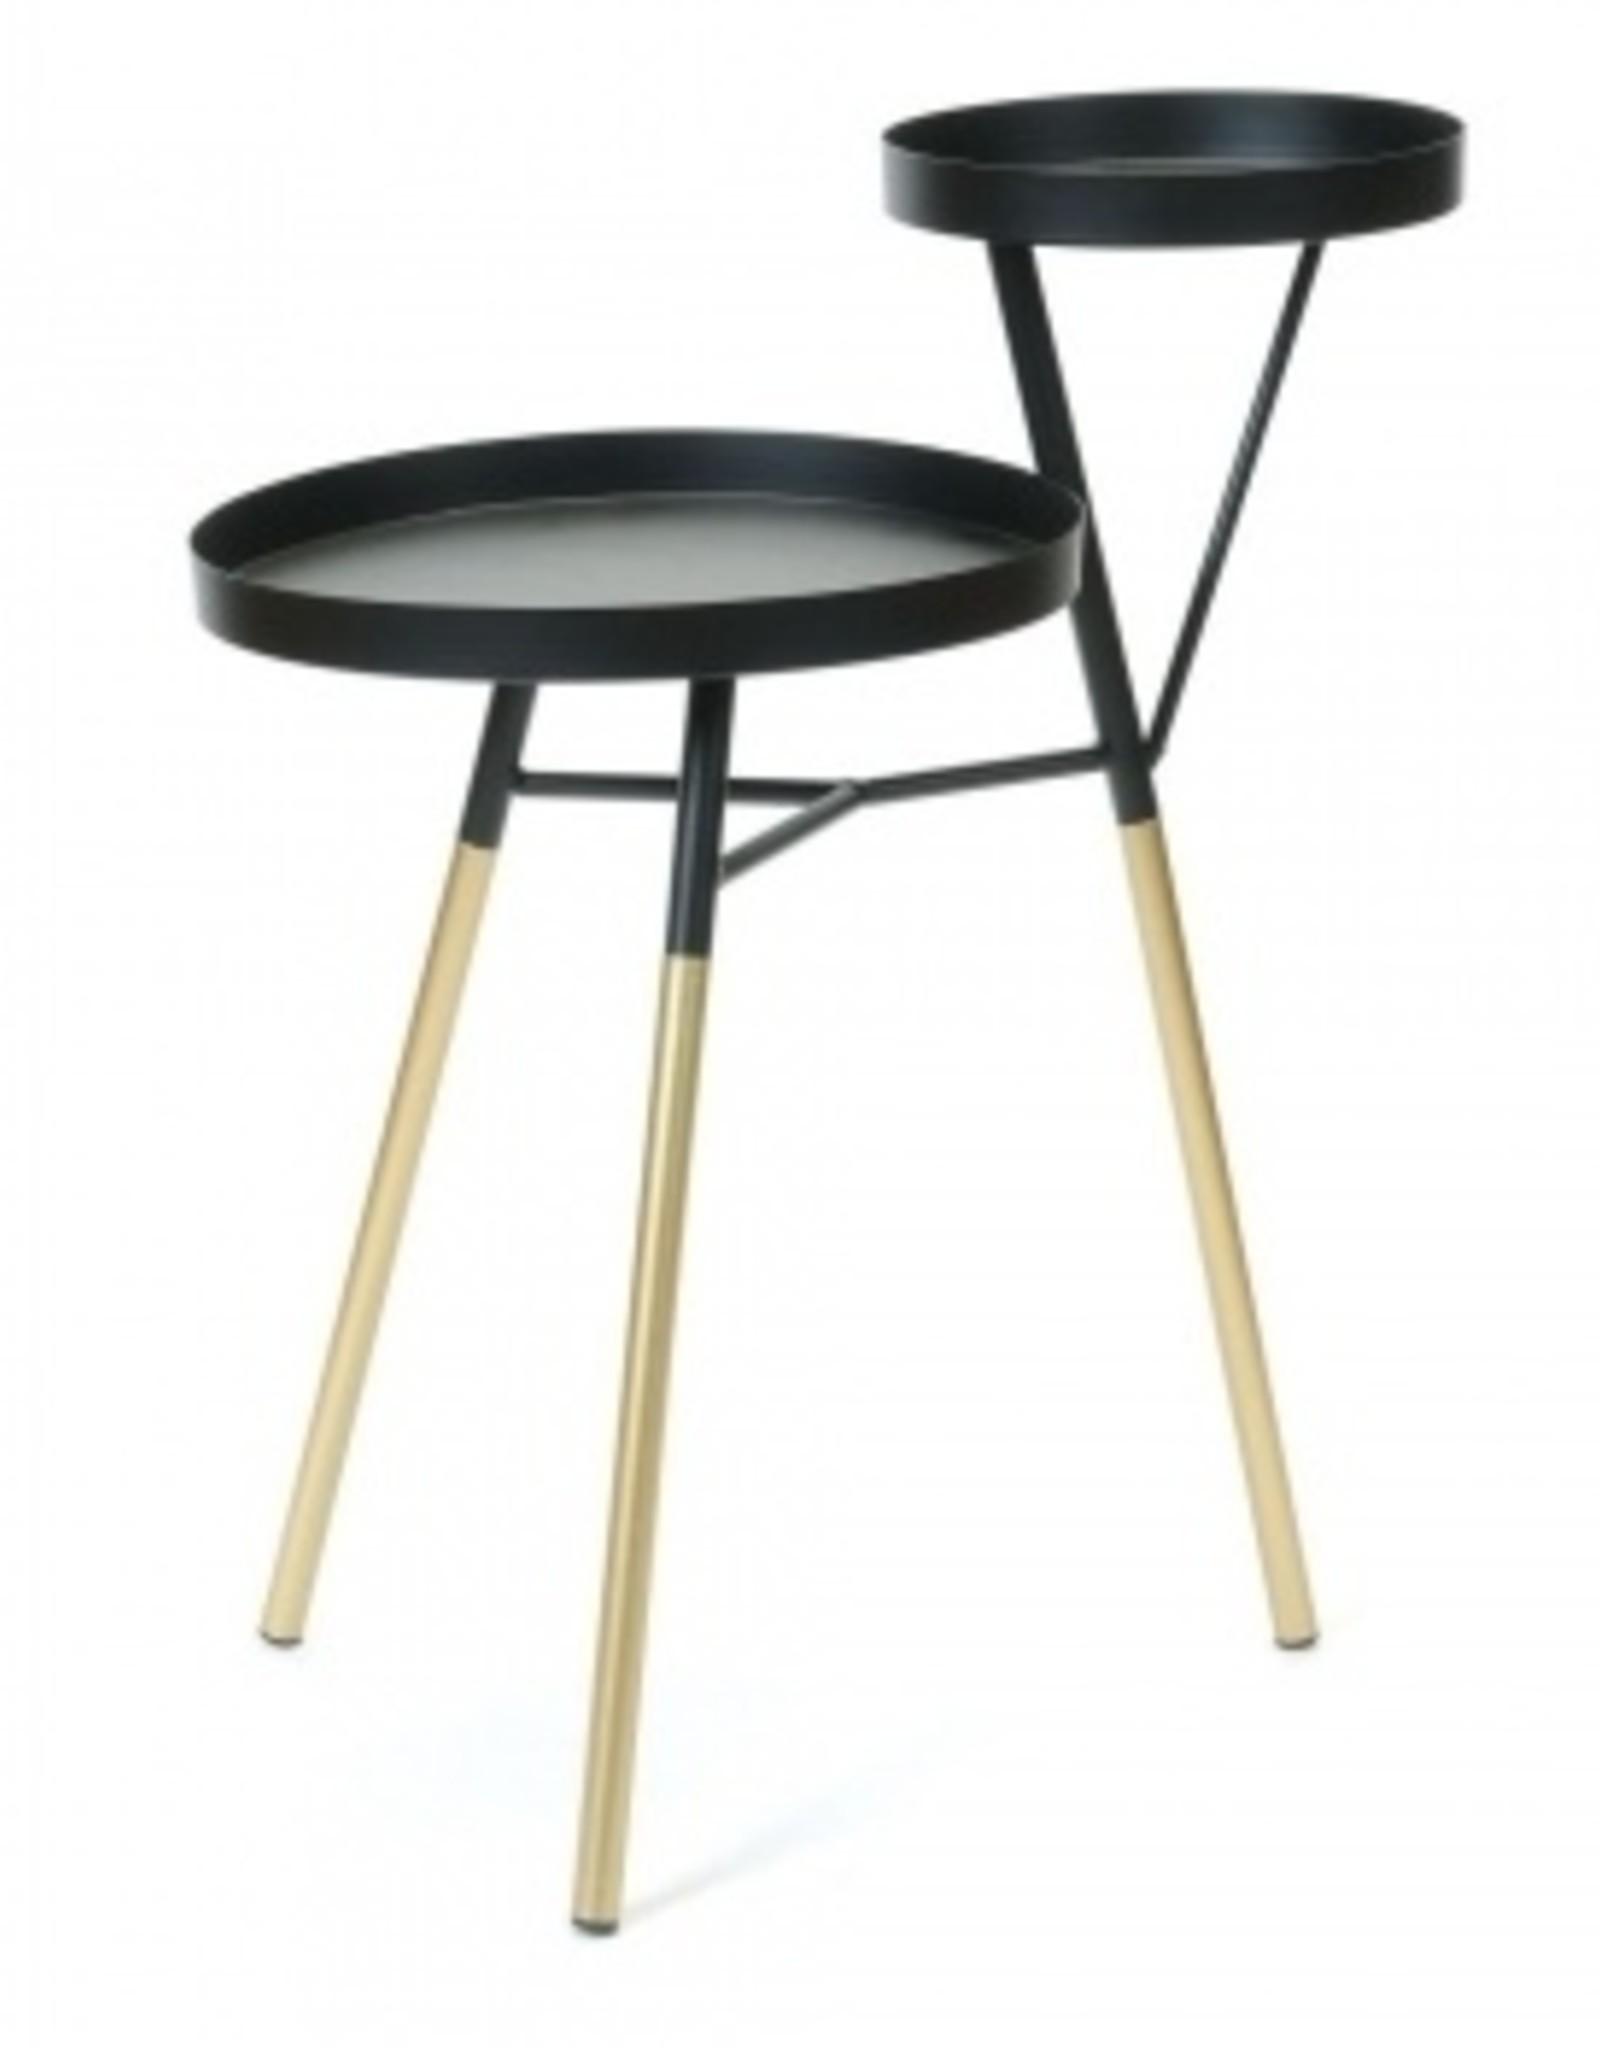 2 Level Side Table black/gold